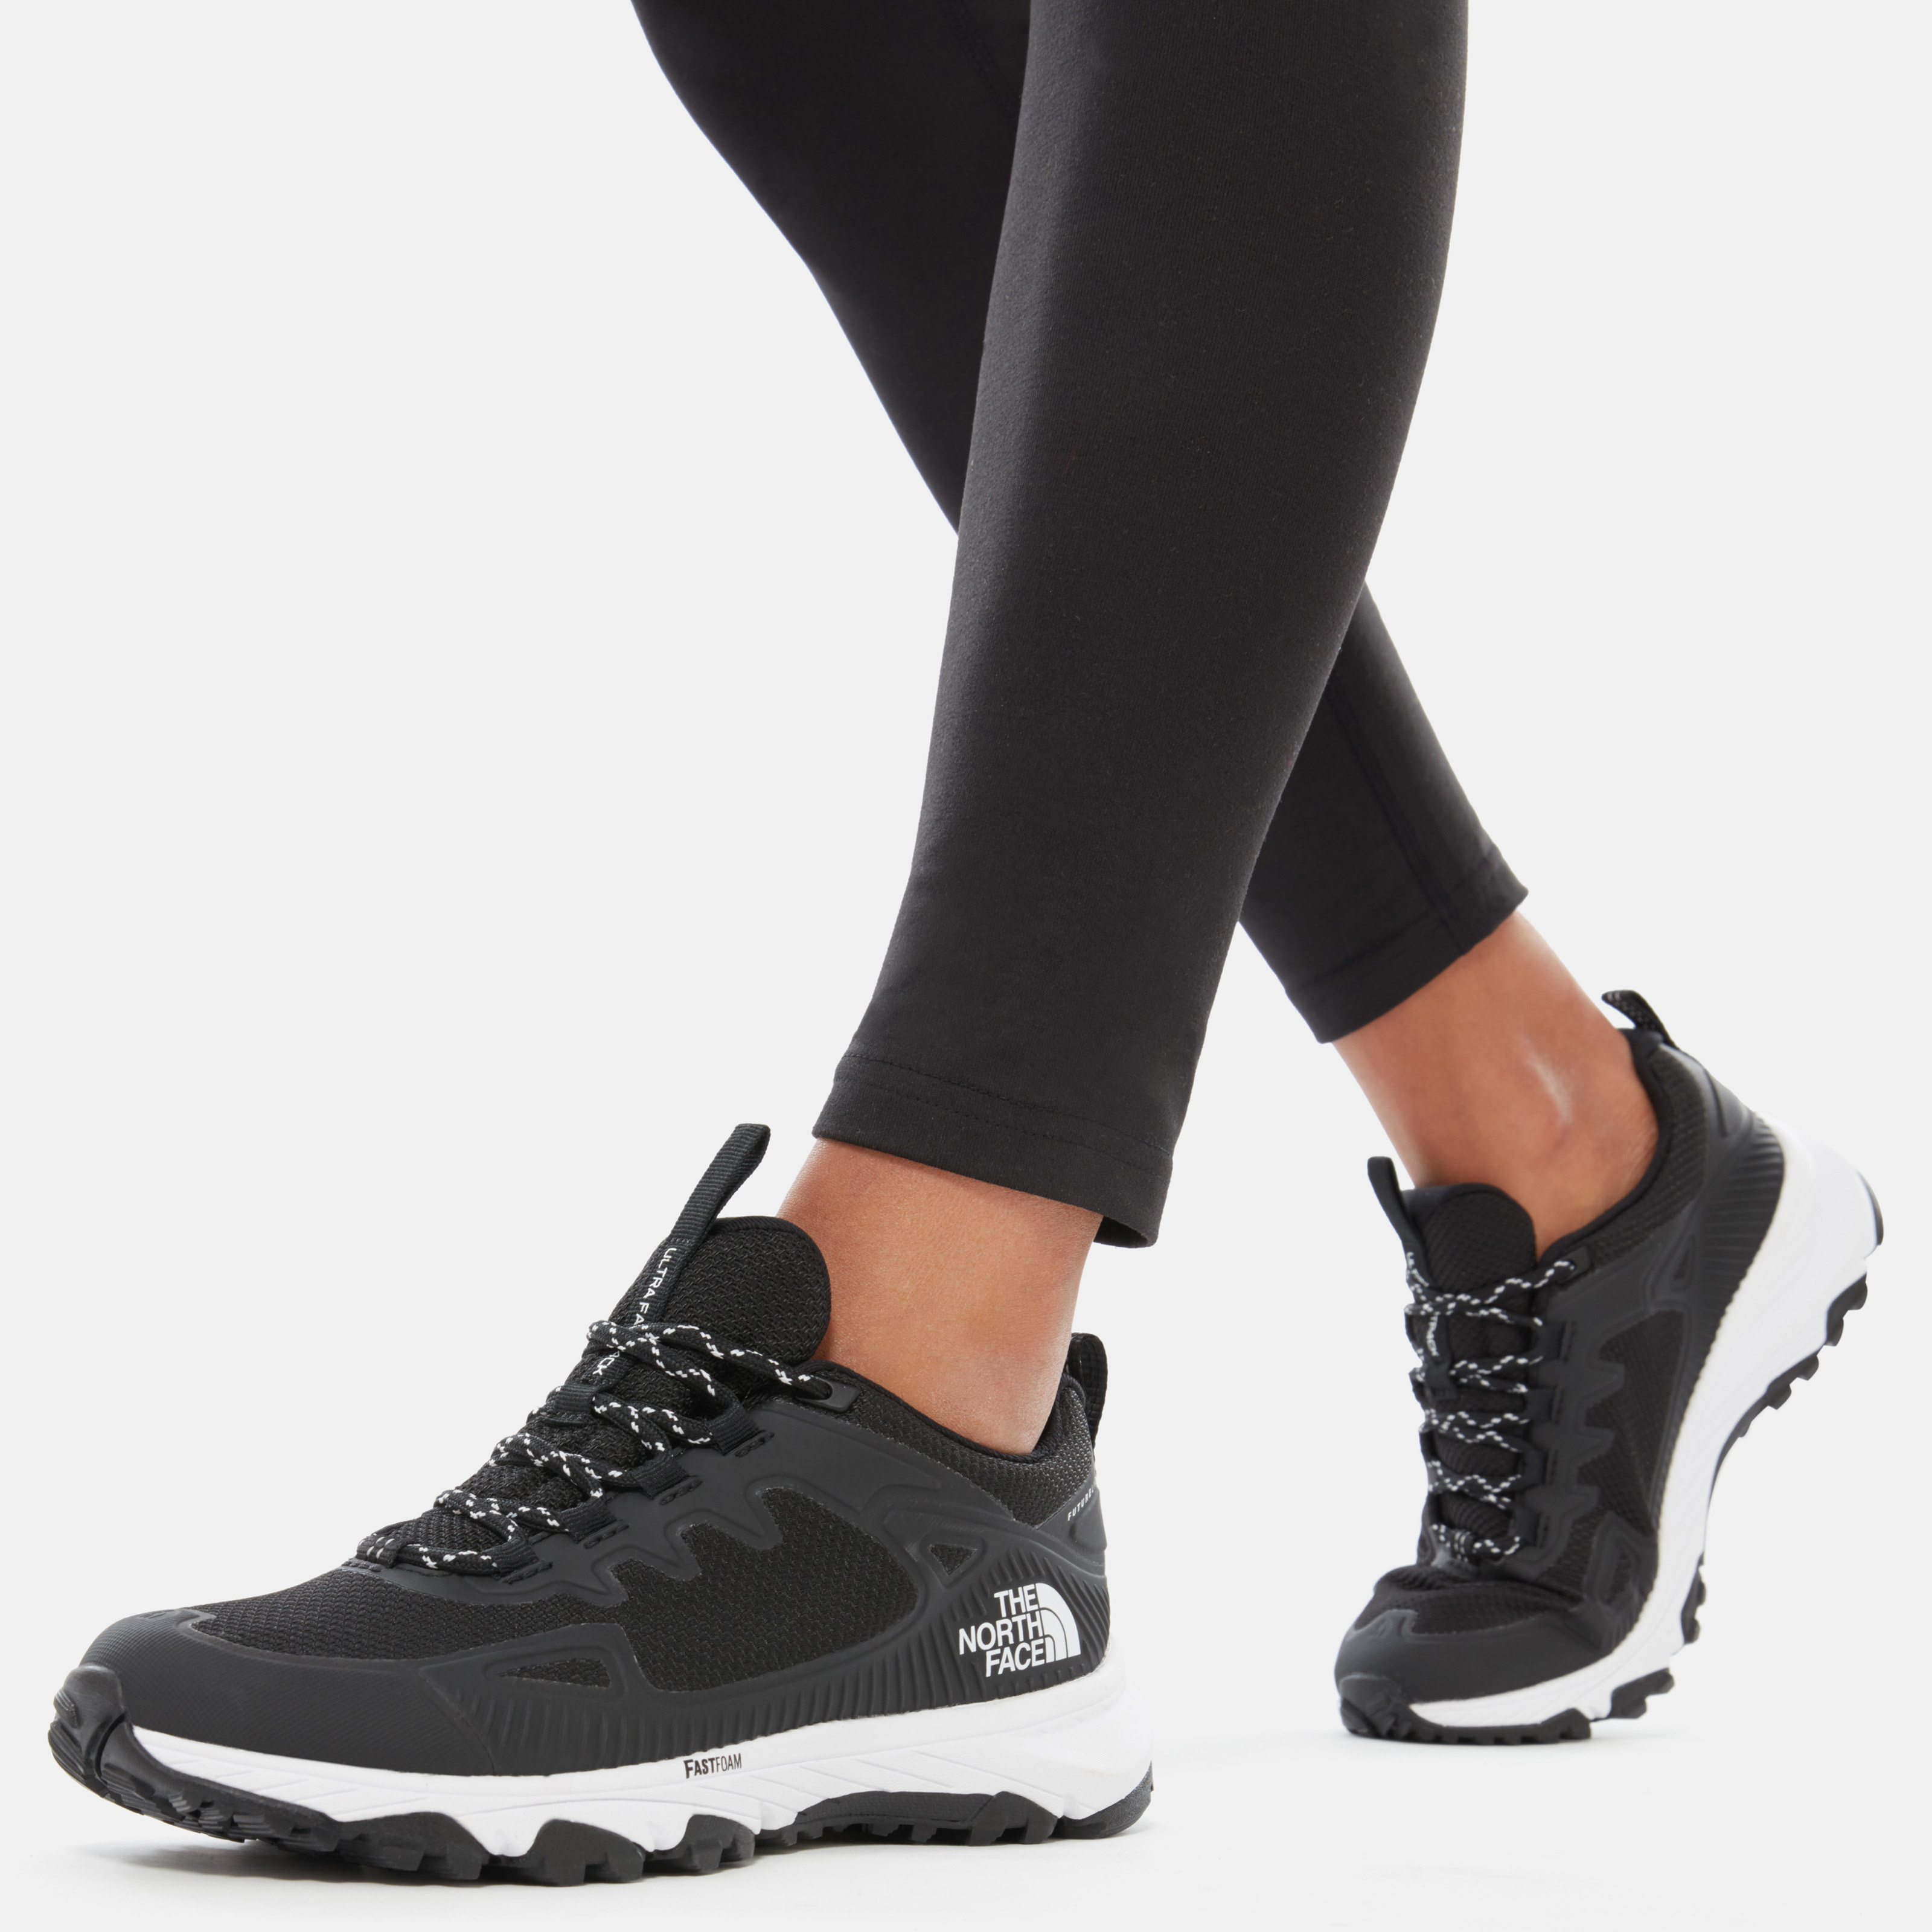 Женские ботинки Ultra Fastpack Iv FUTURELIGHT™ фото